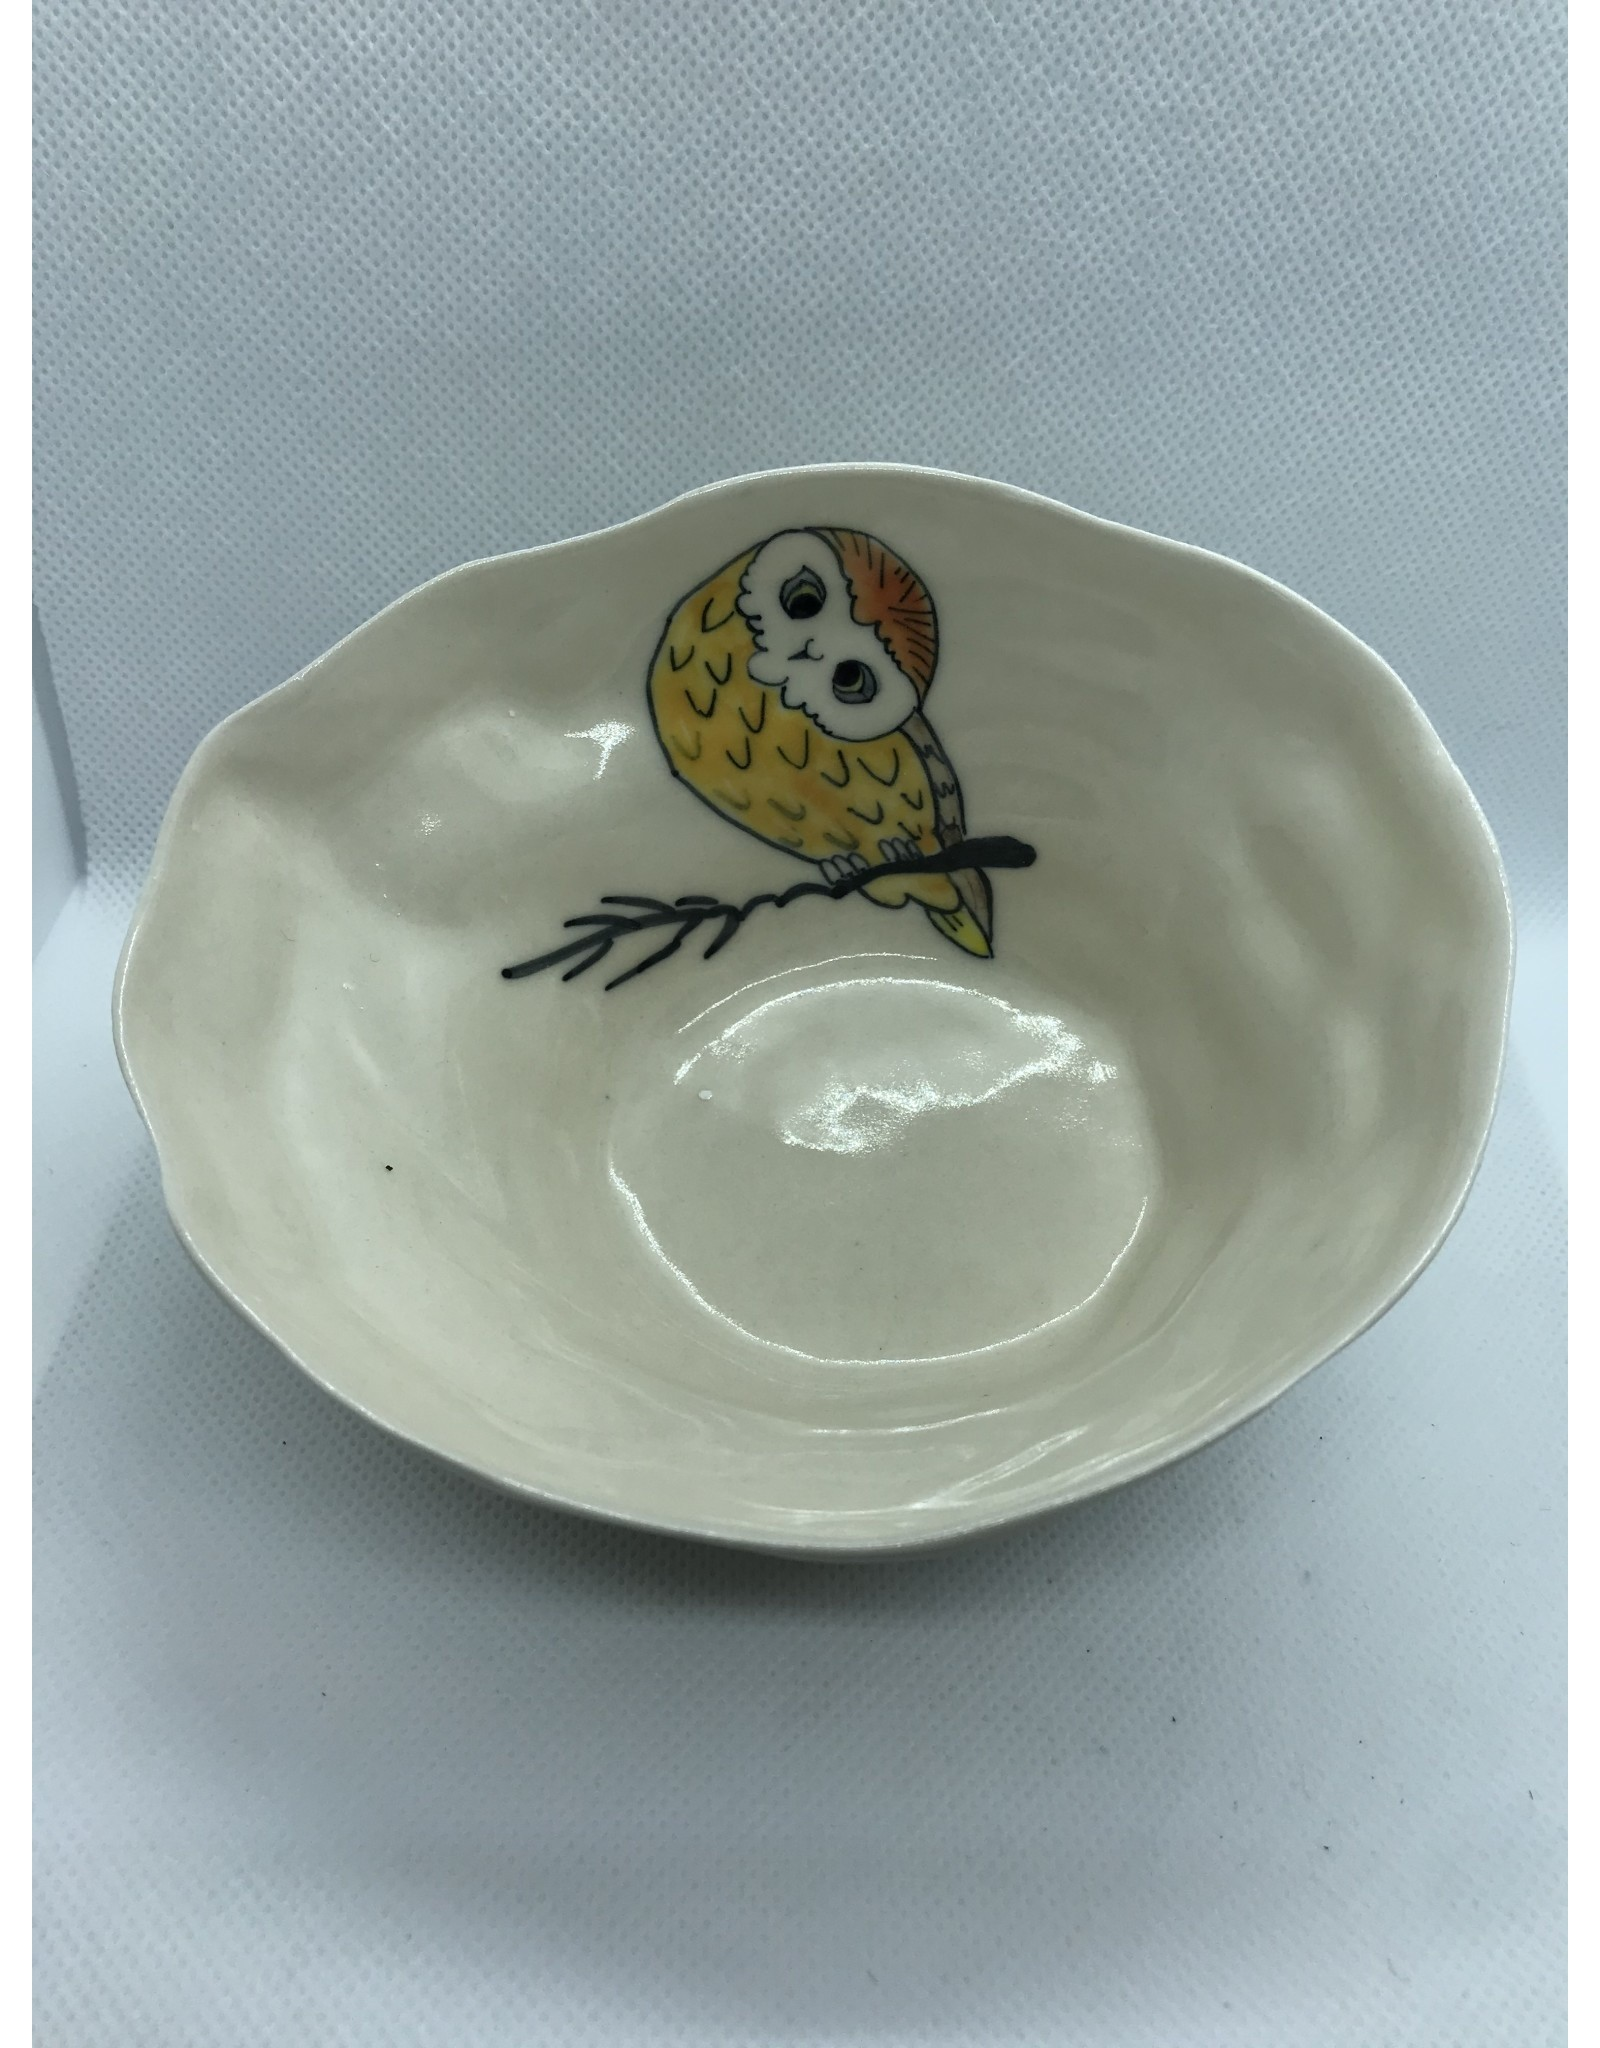 Ceramic Animal Bowl, Owl, Vietnam